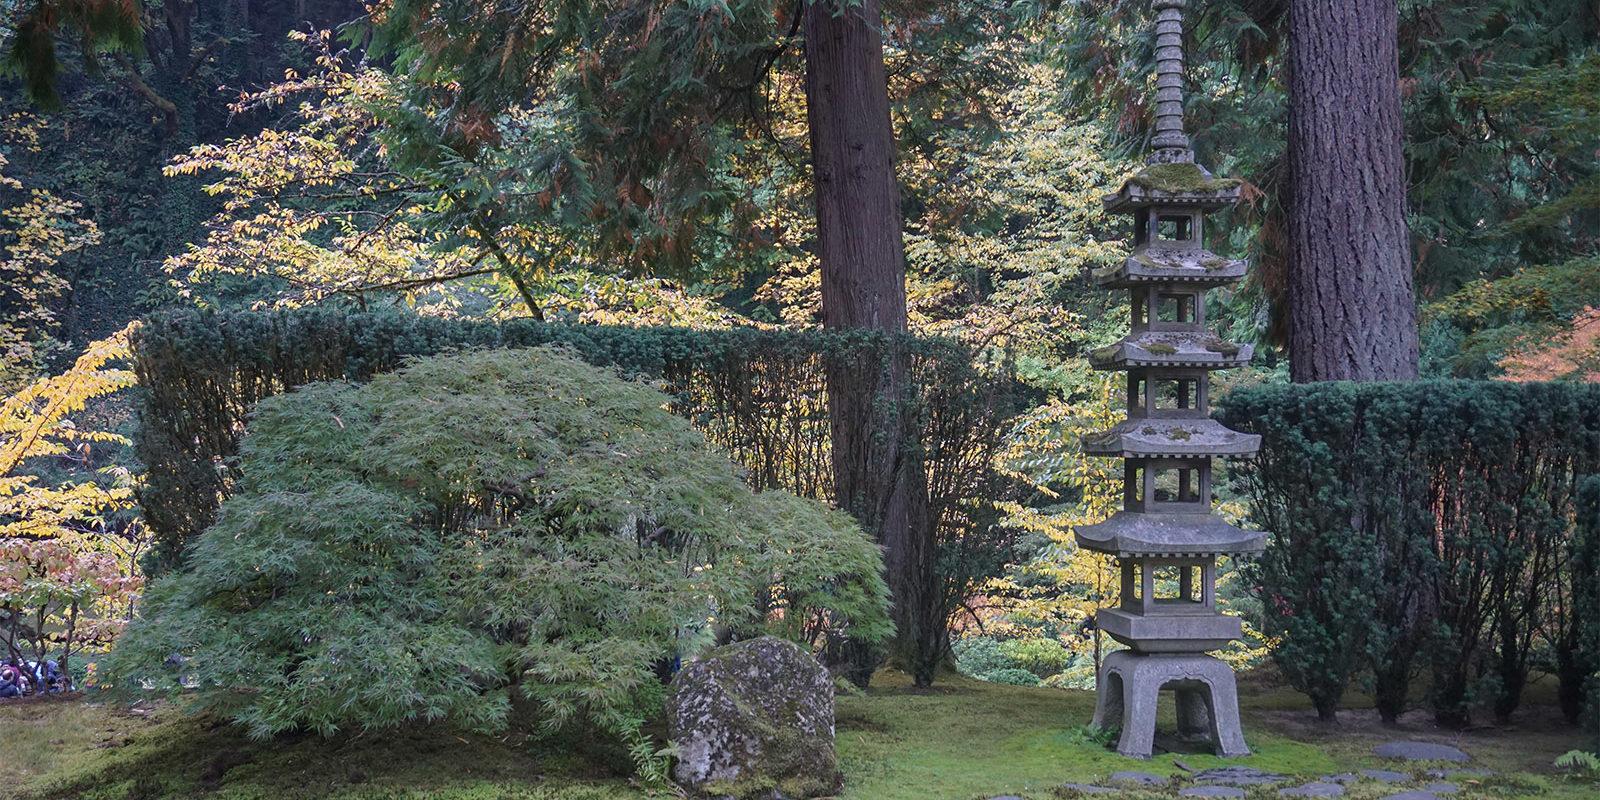 October Fall Photos of Portland Japanese Garden - 2018-10-22 - DSC01034_low